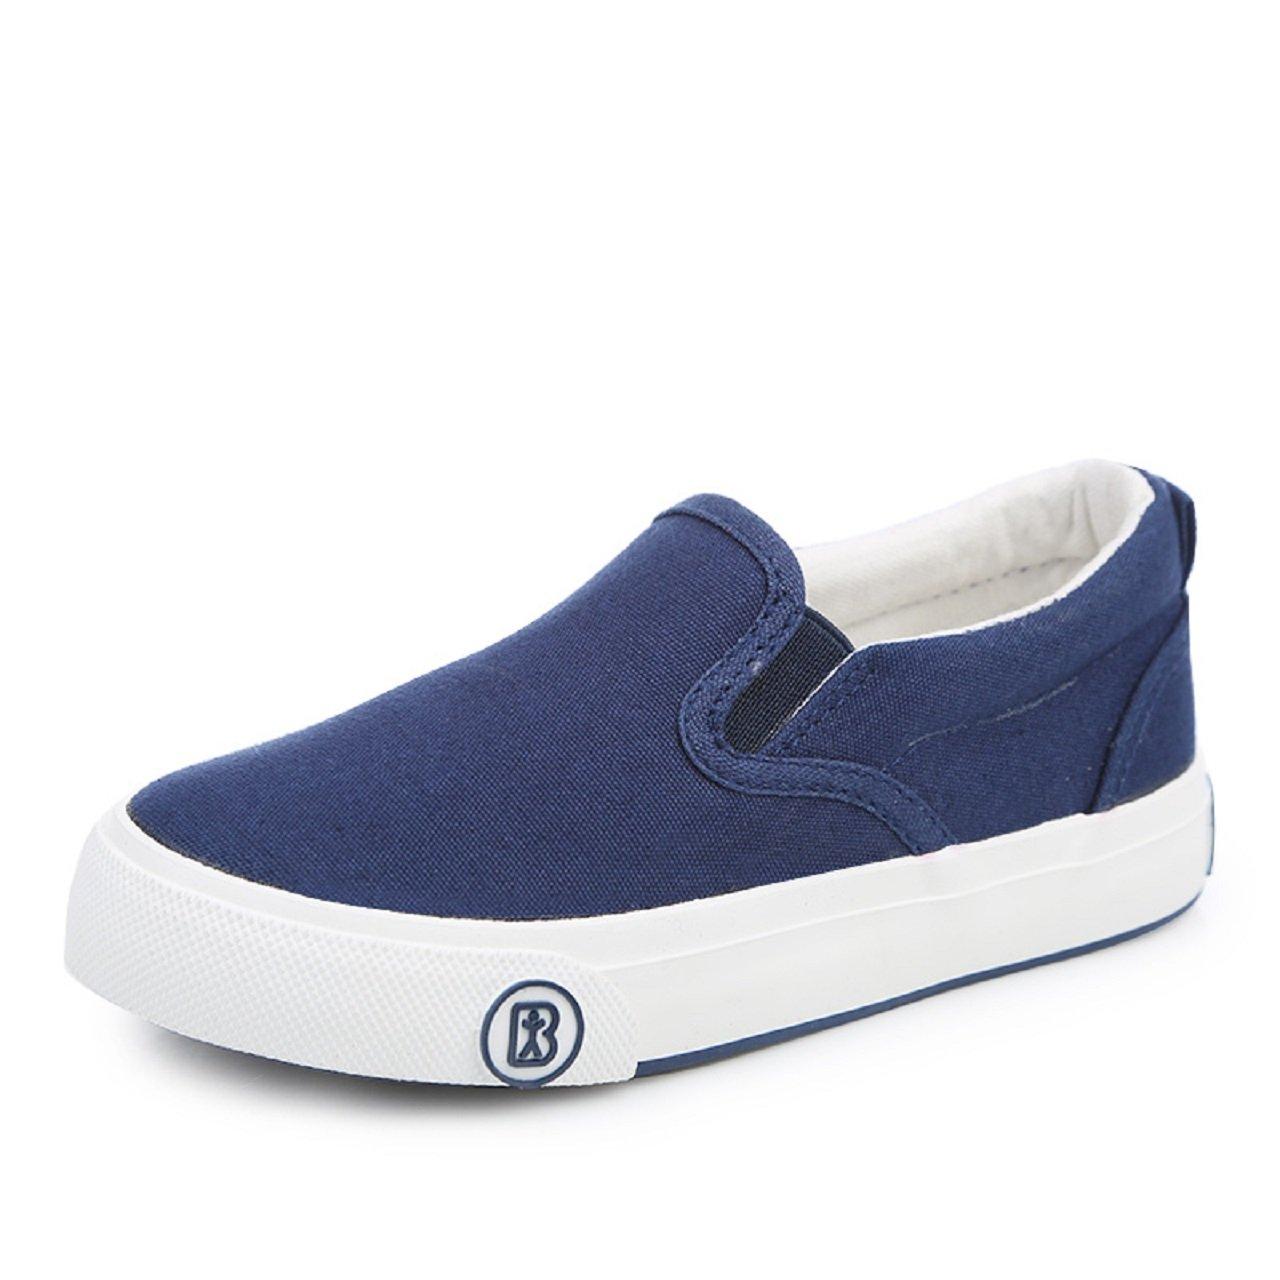 RENBEN Kids Slip On Platform Toddler Sneakers Casual Low Cut Canvas Fashion Shoes